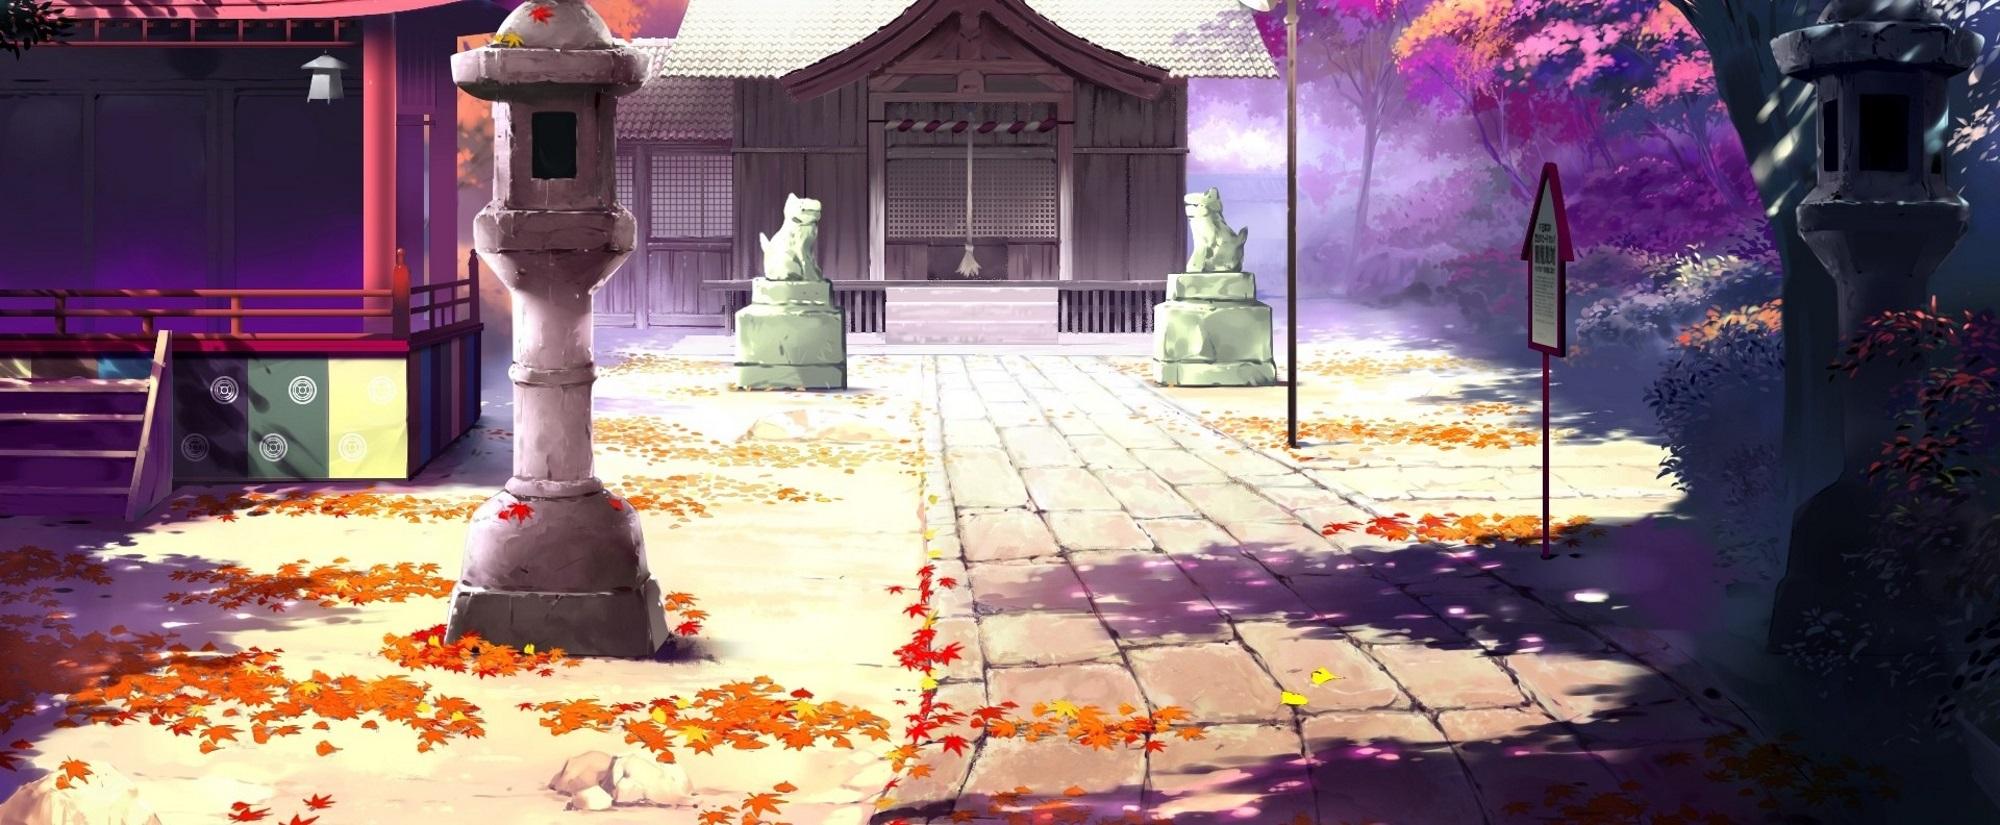 XL Background - Temple 01.jpg